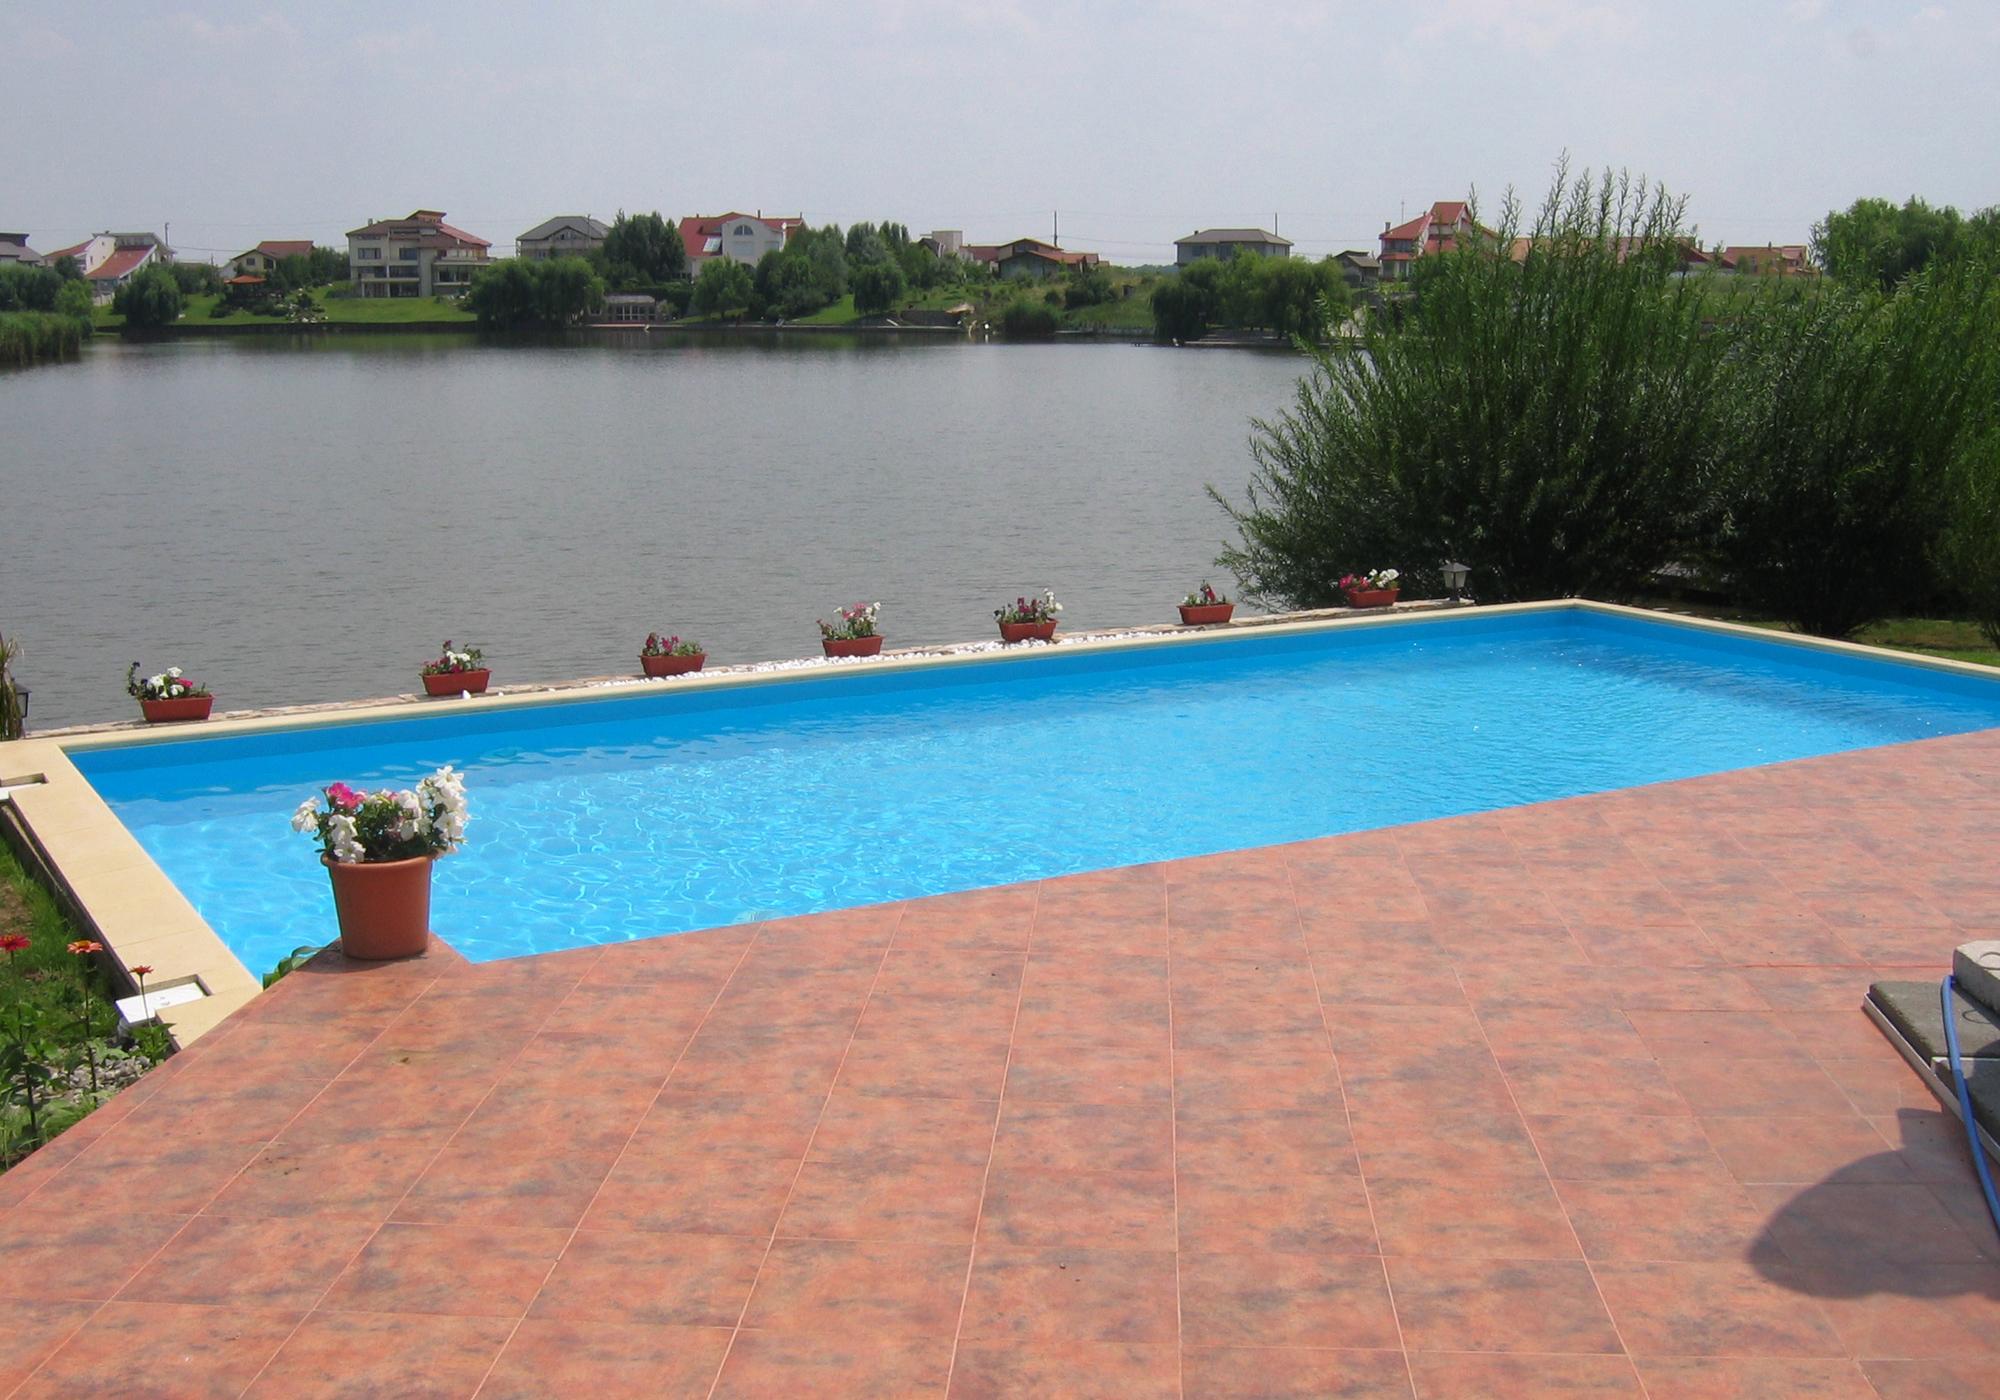 piscine rezidentiale din panouri modulare de otel. Black Bedroom Furniture Sets. Home Design Ideas